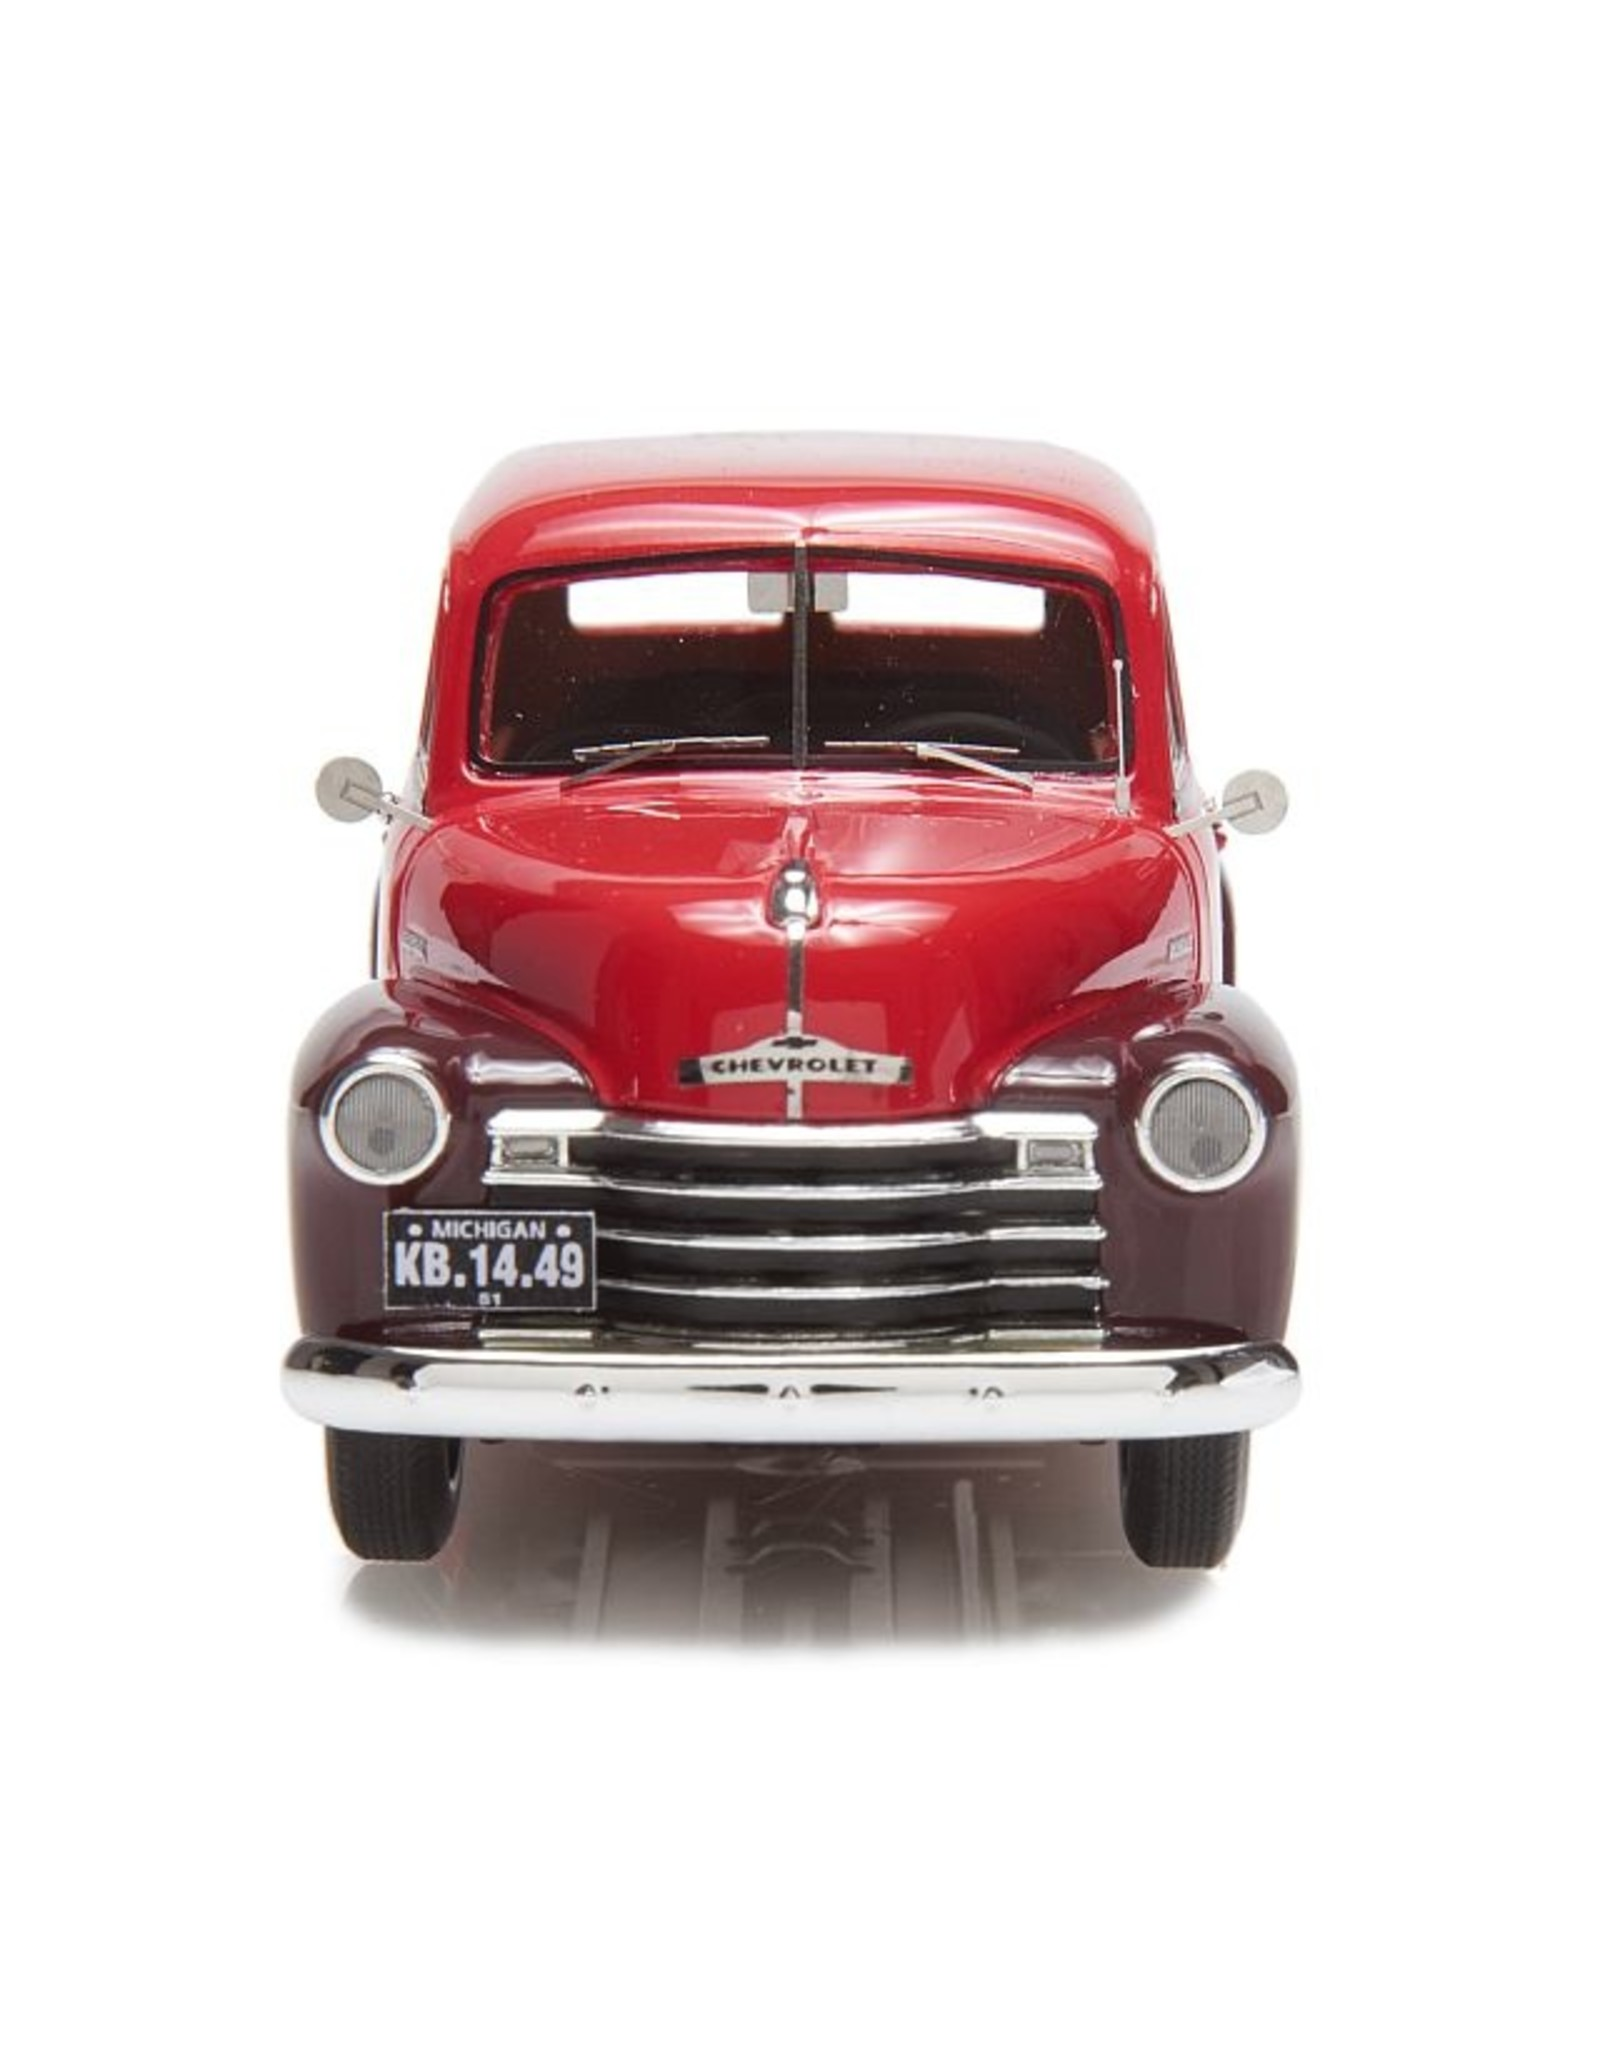 Chevrolet CHEVROLET SUBURBAN-DUBBELE ACHTERDEUR(1949-53)chestnut brown/red.